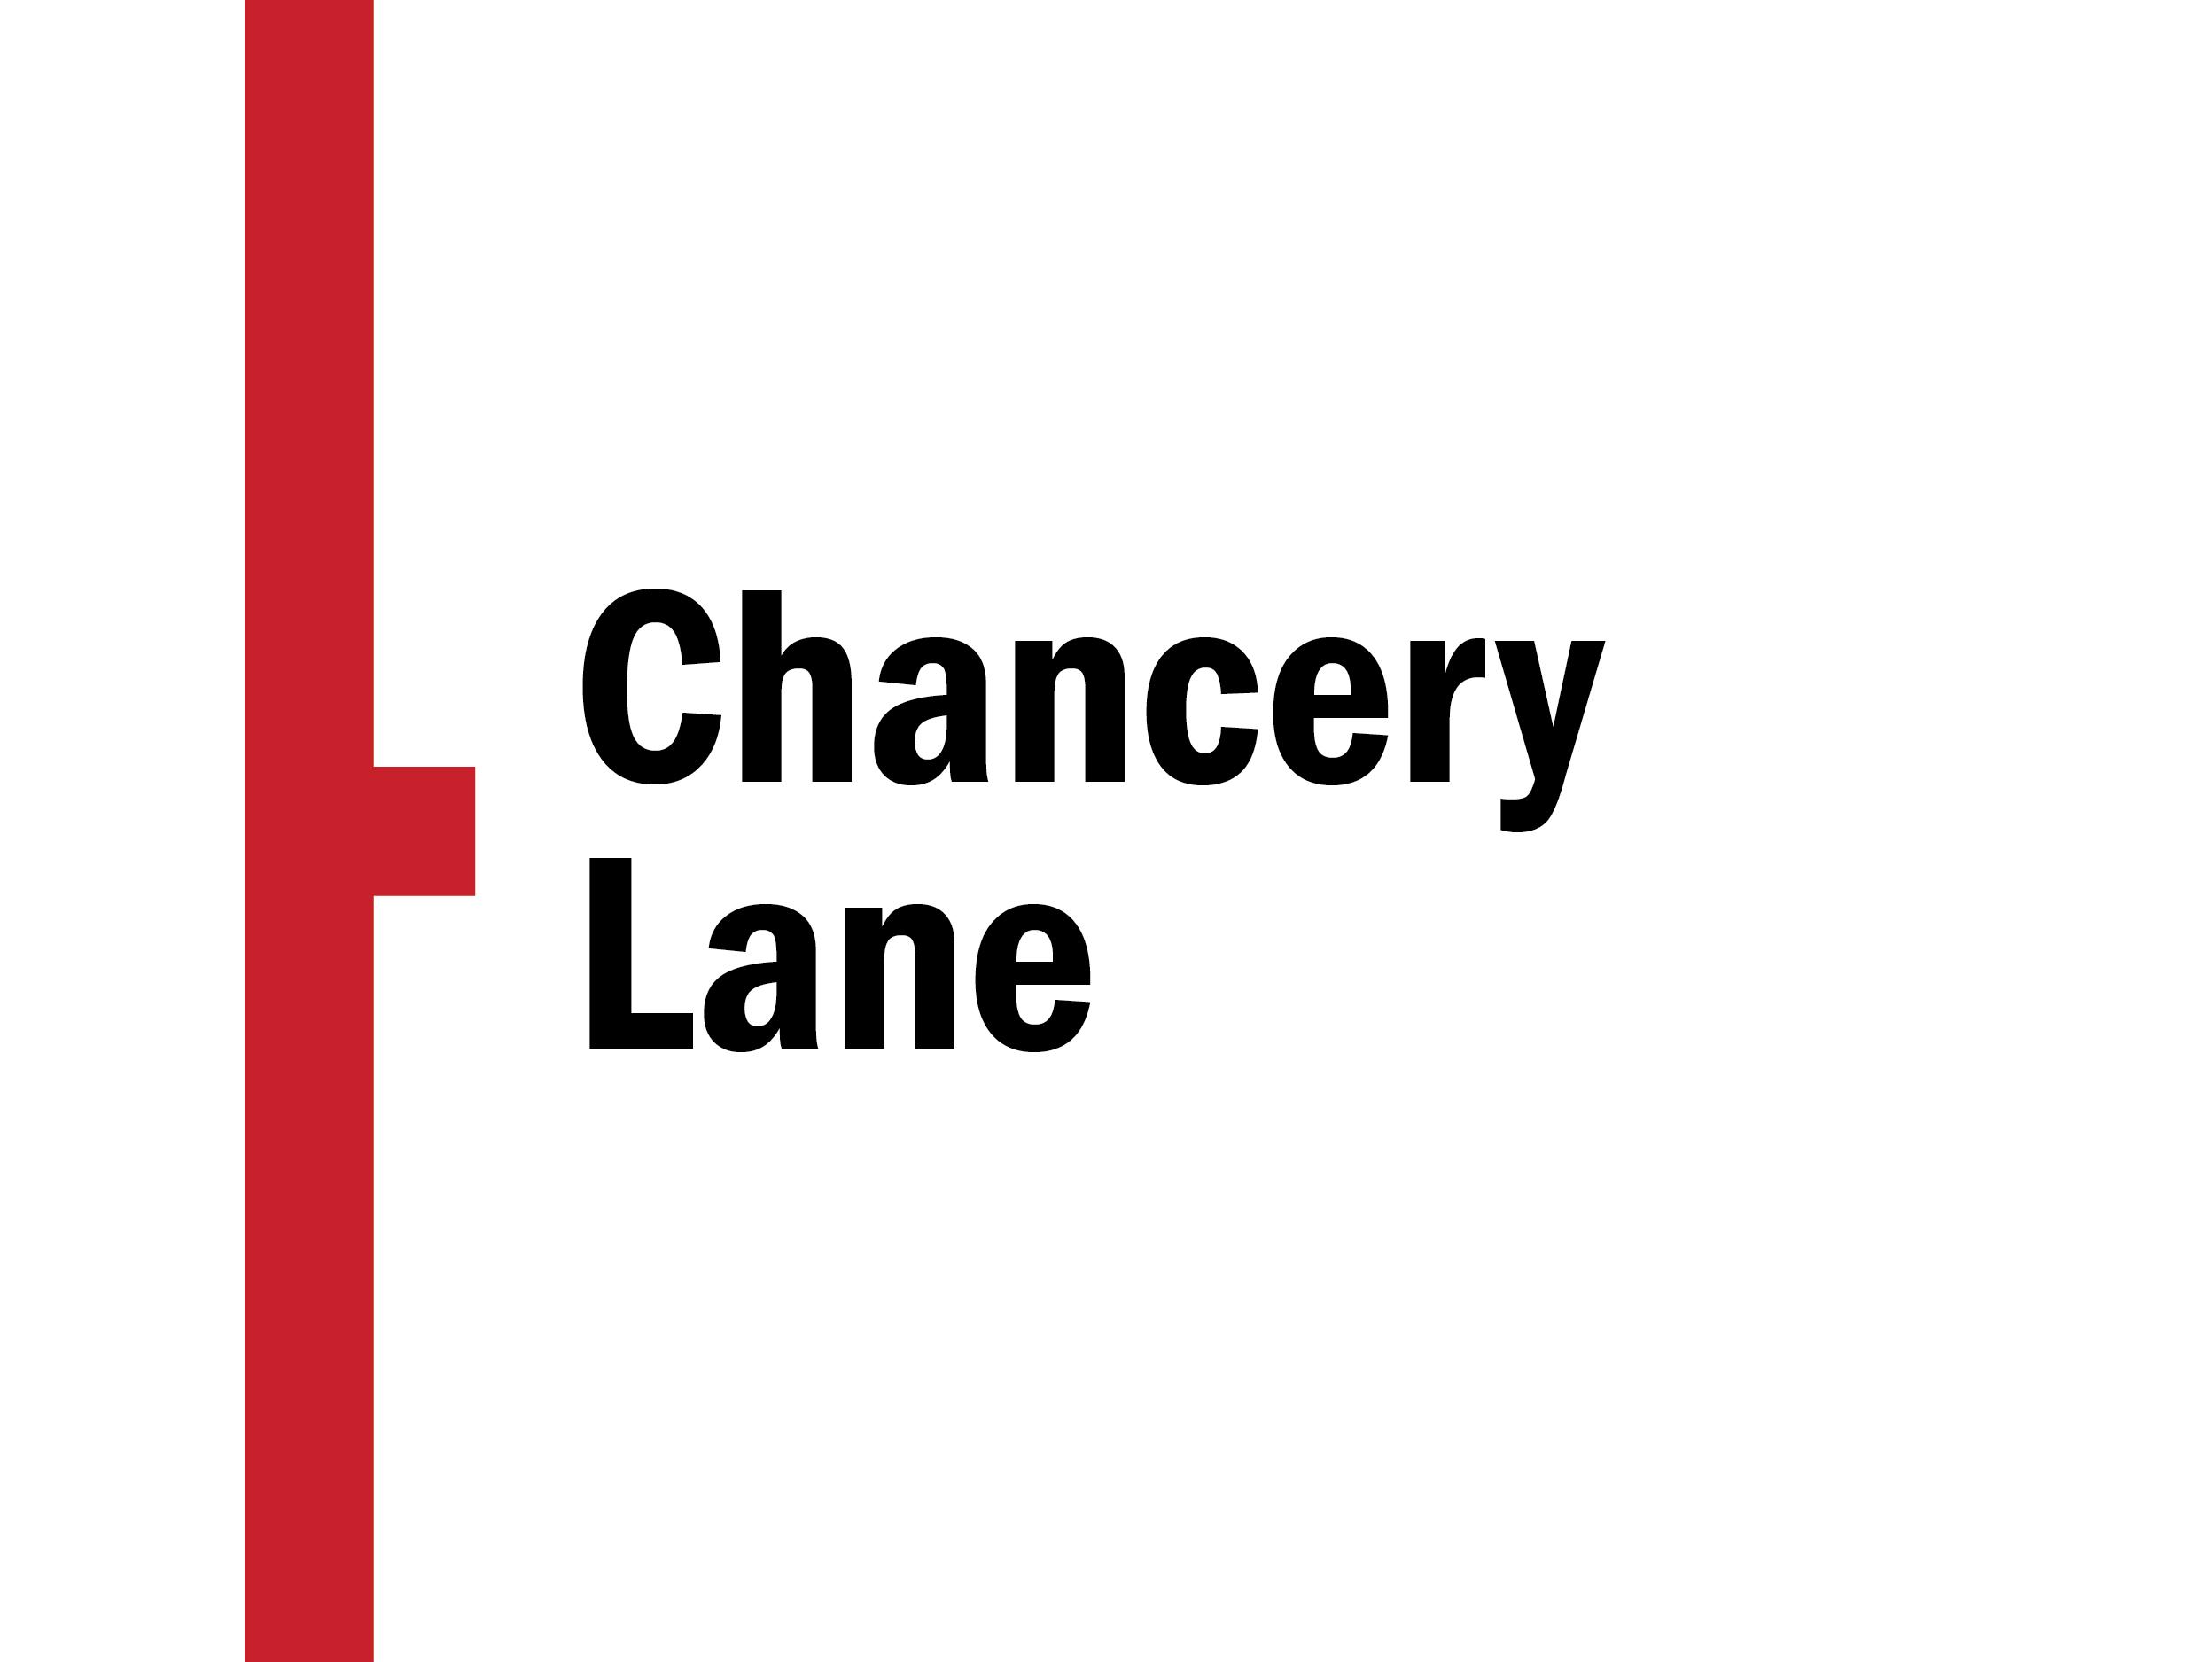 Night tube: Chancery Lane